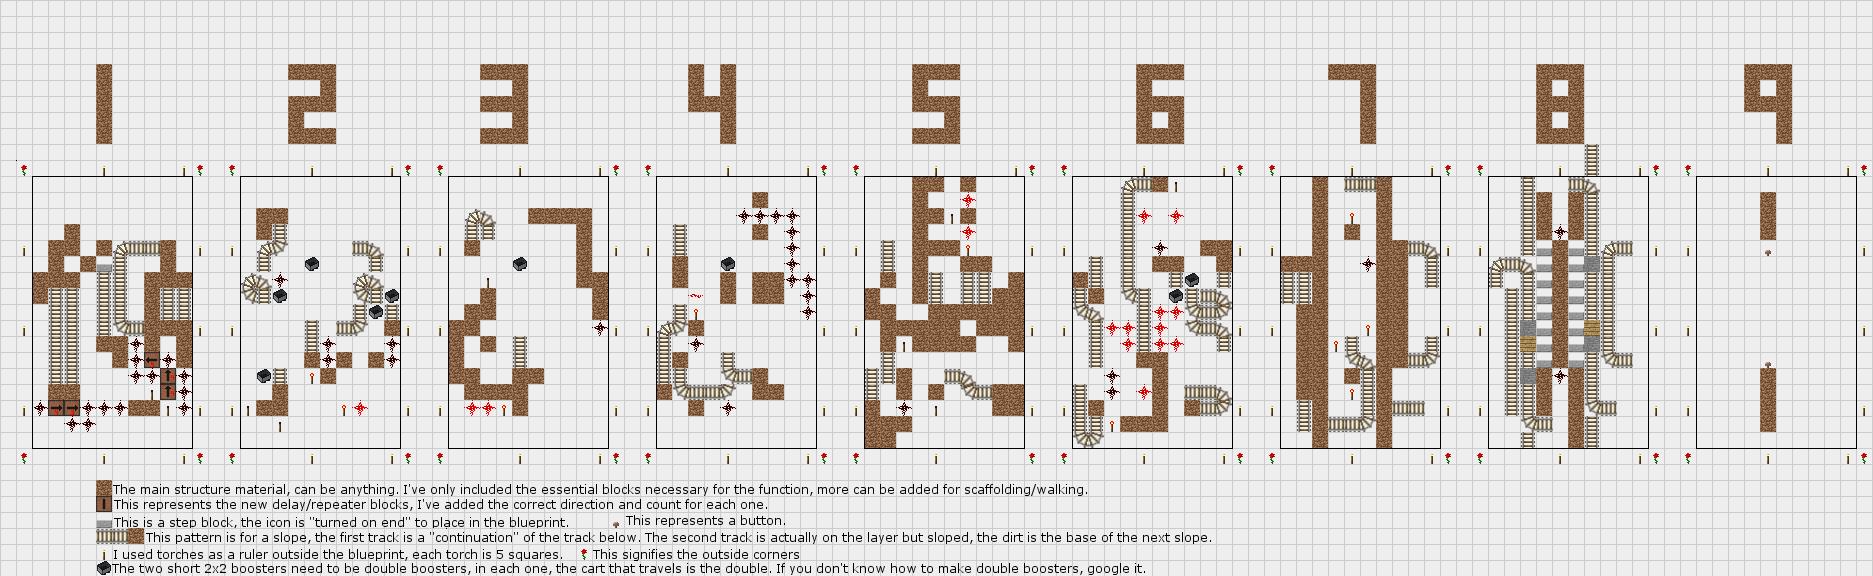 Enchanting mansion blueprints for minecraft gallery plan for Minecraft 3d blueprint maker